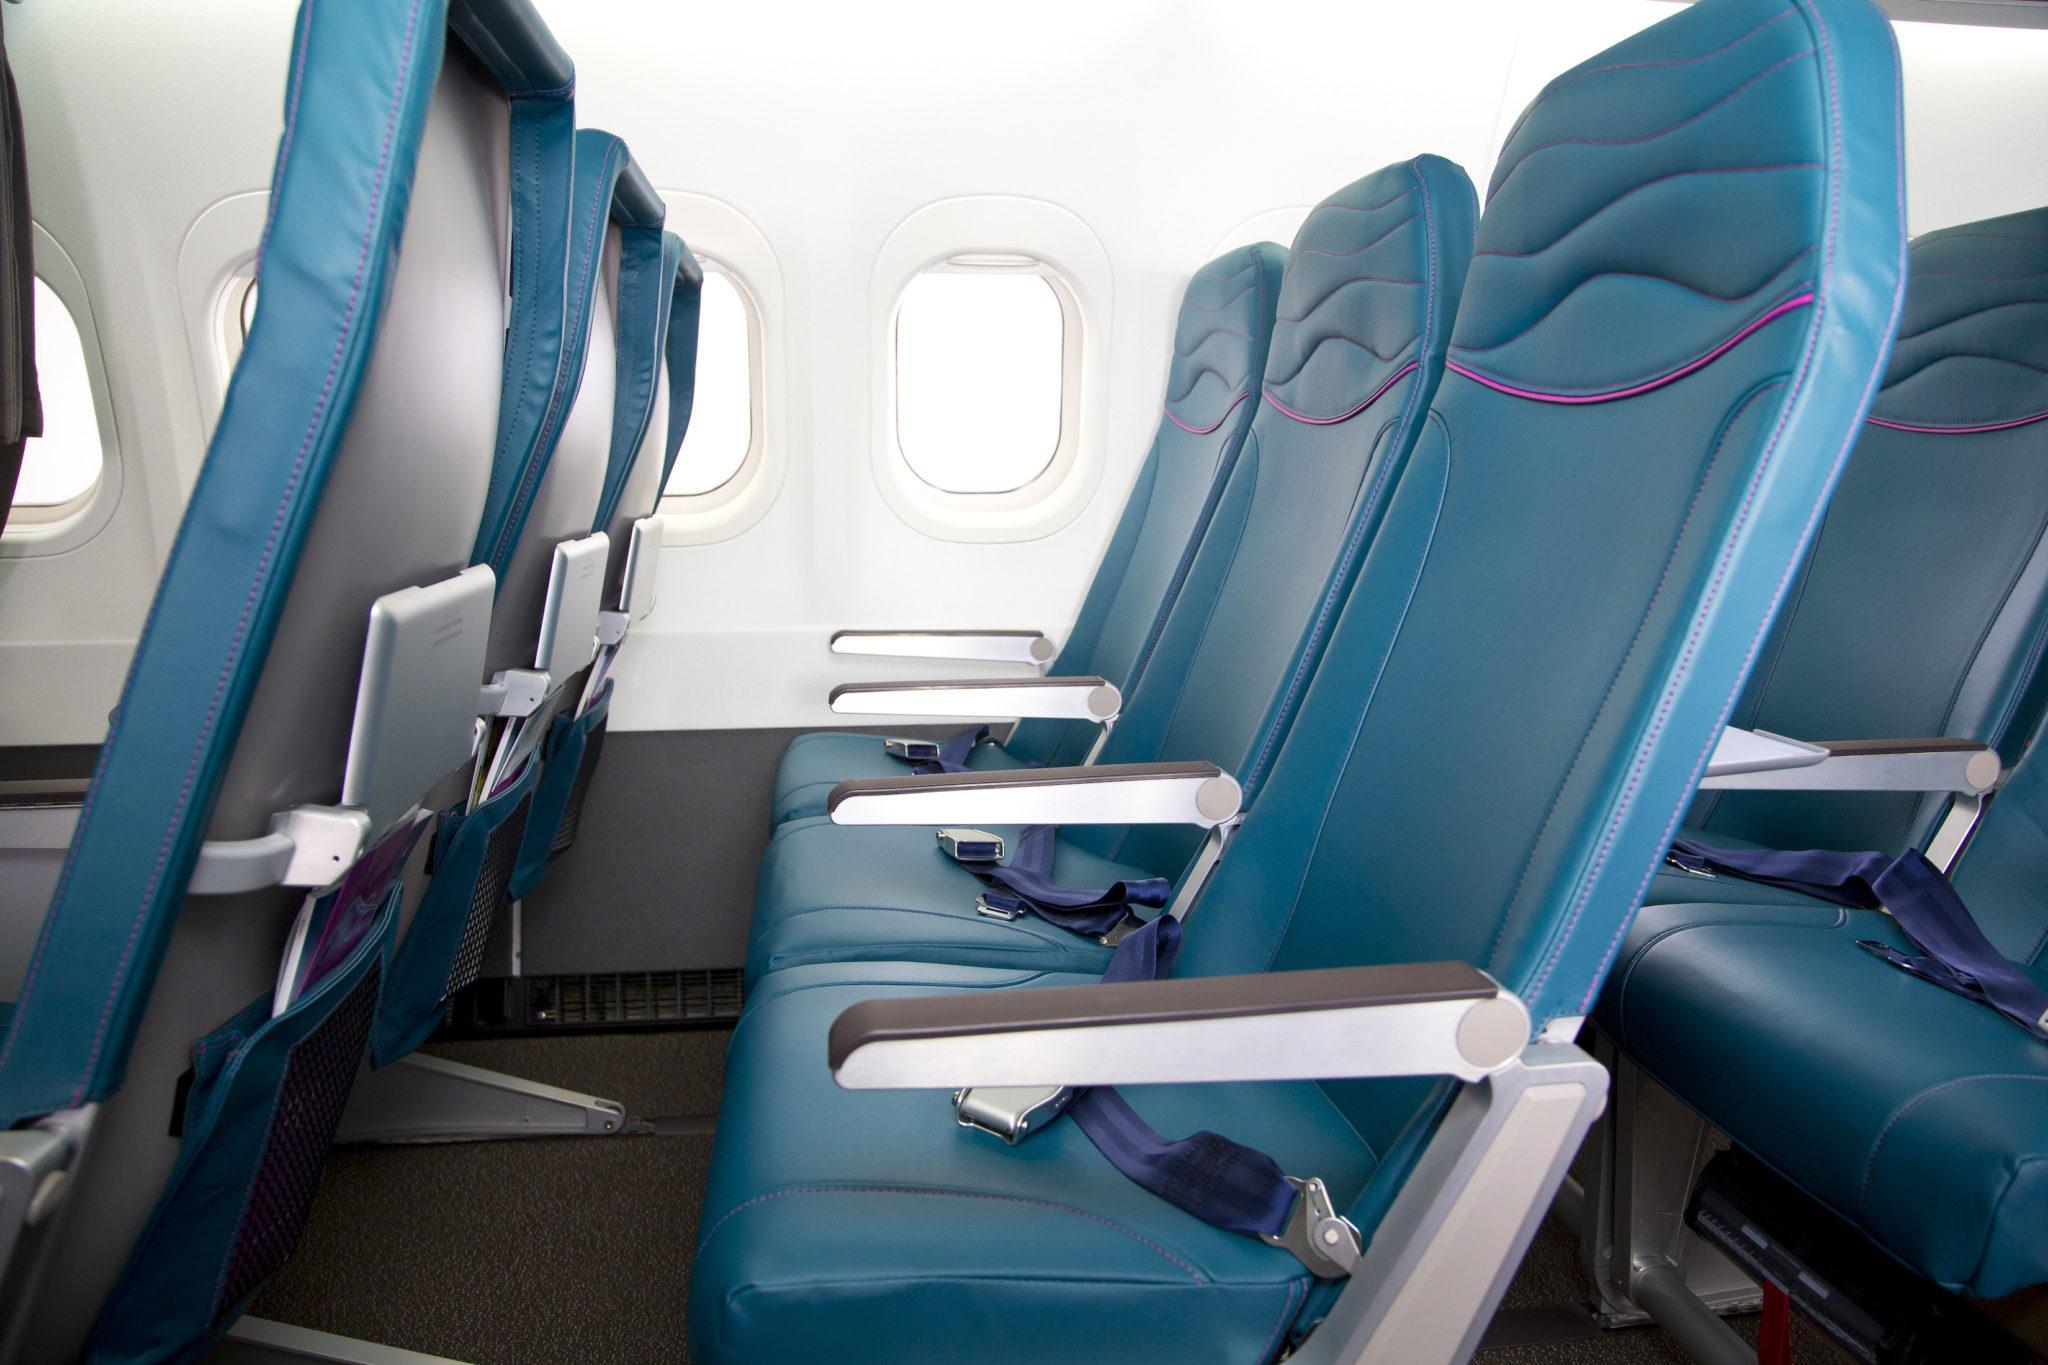 Why Hawaiian Airlines Use Of Slimline Seats Makes Sense Runway Girlrunway Girl